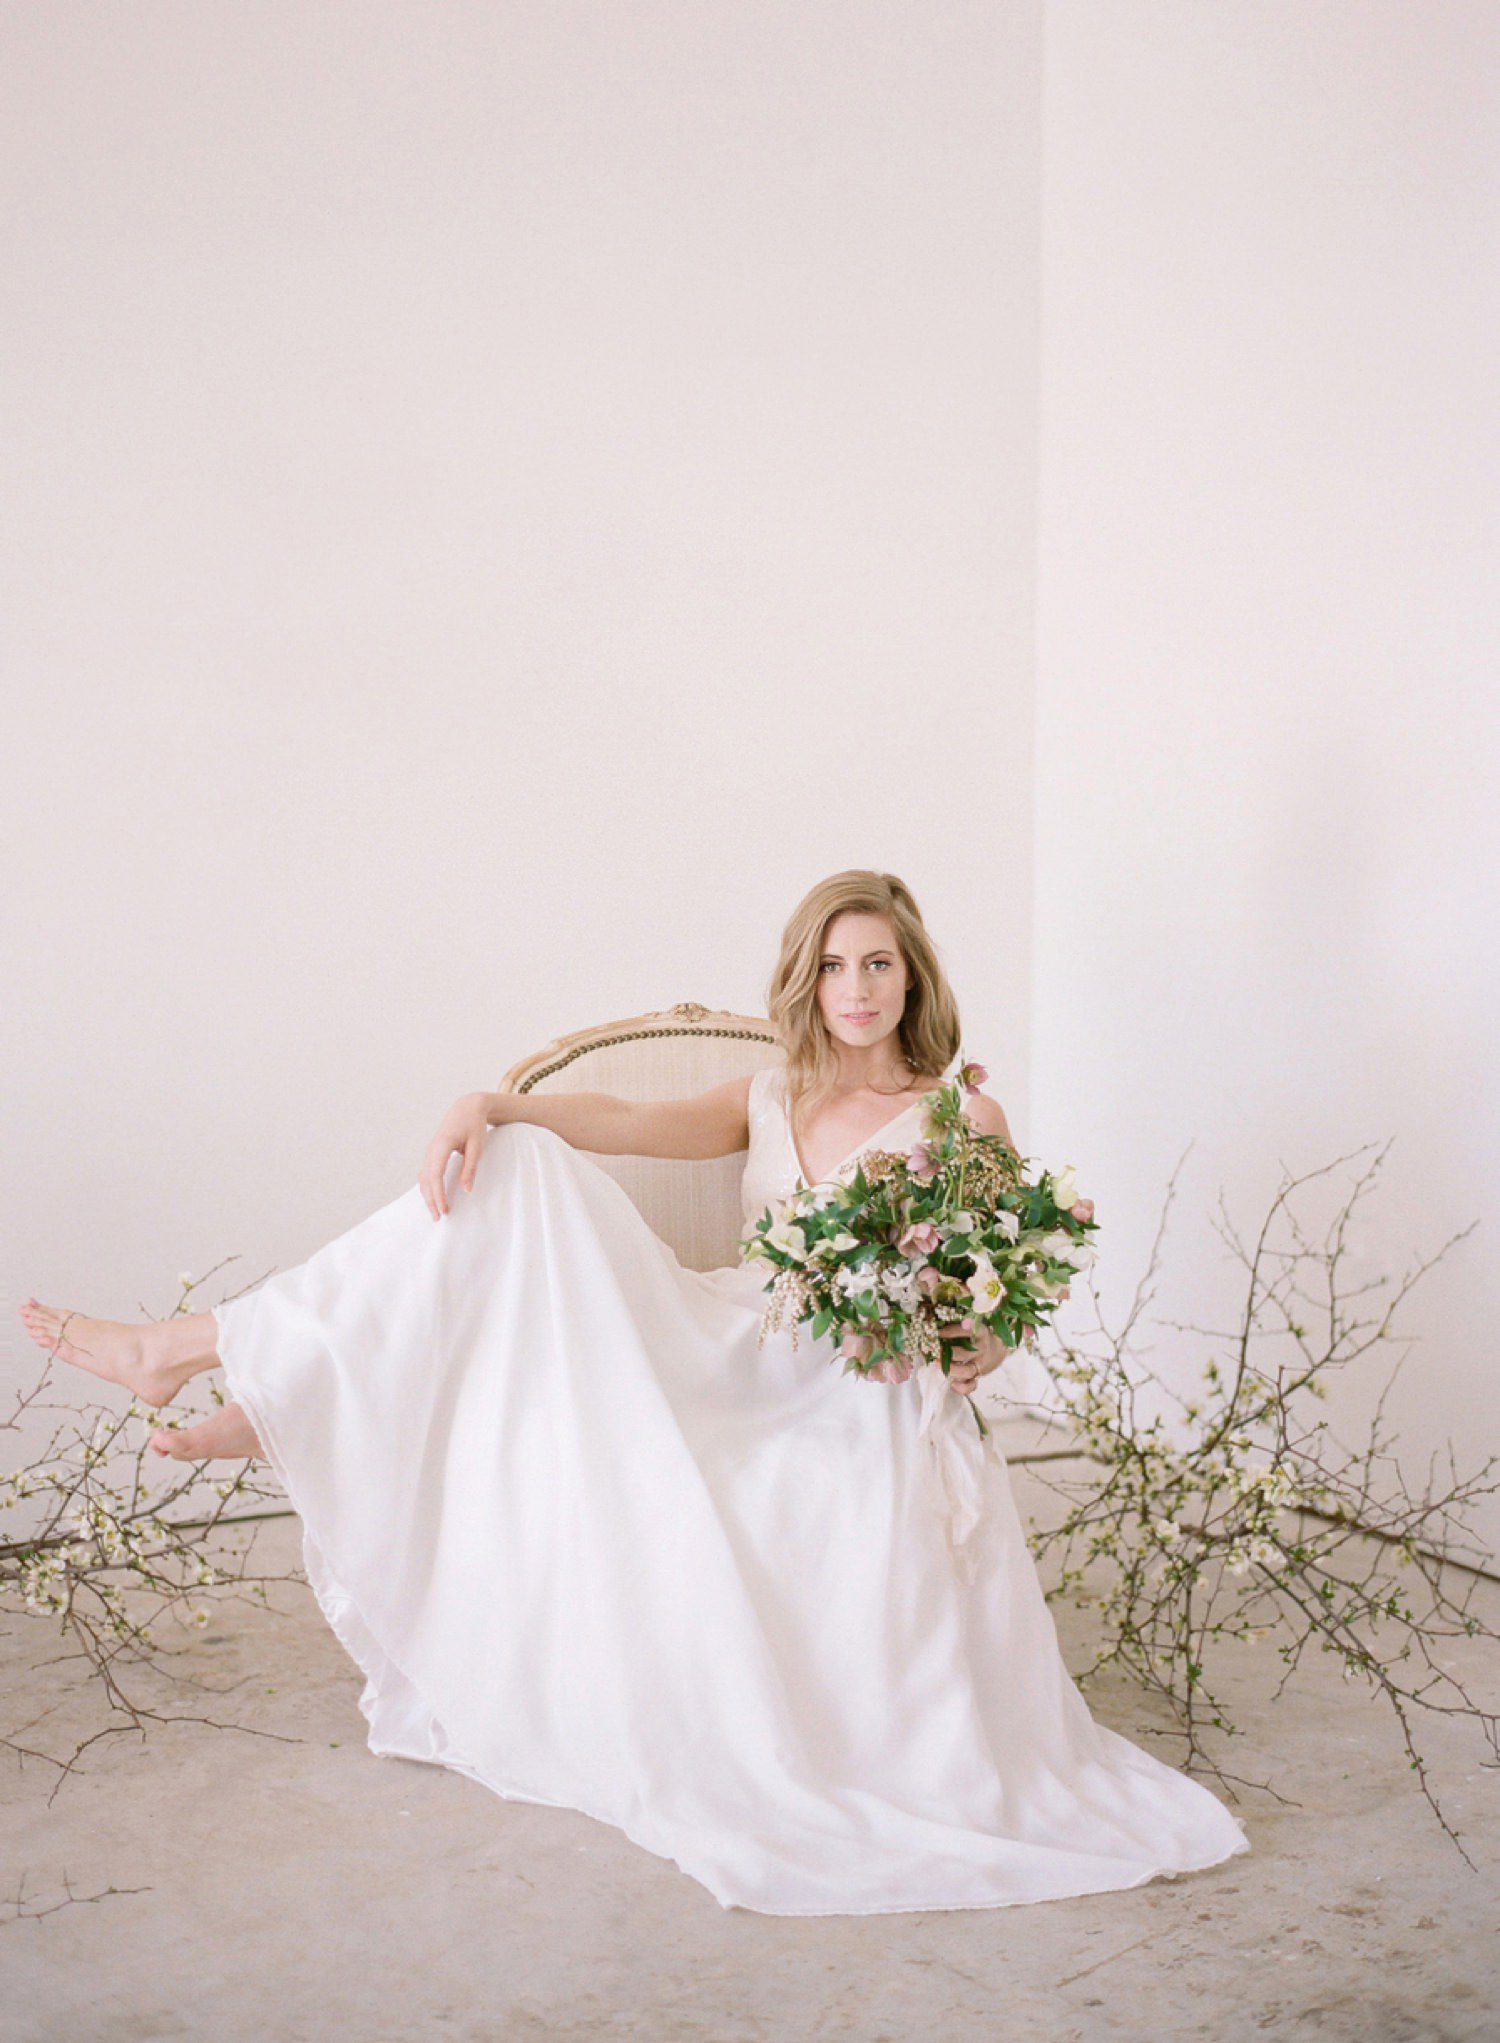 bridal fashion photographer washington dc